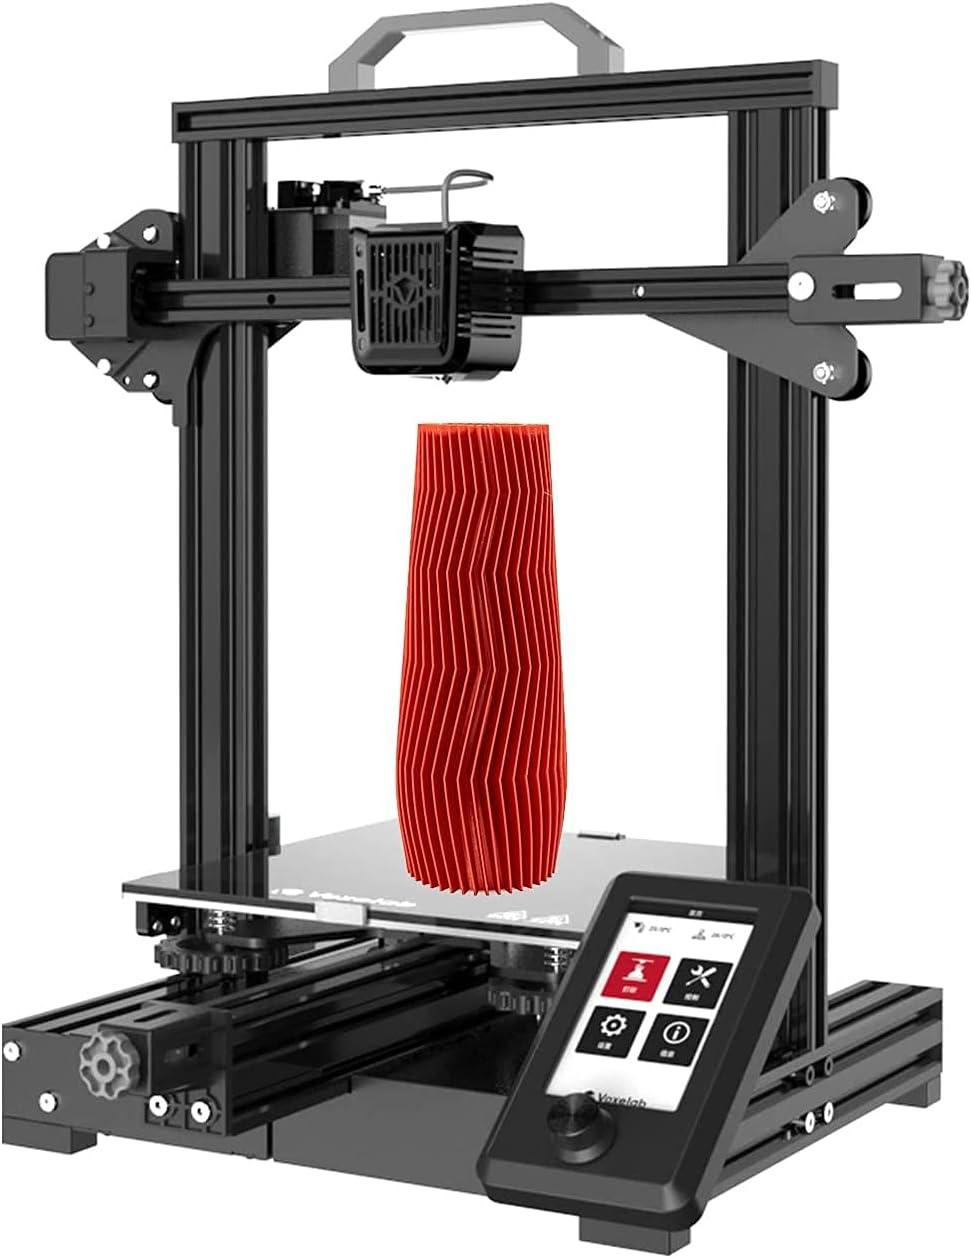 Voxelab Aquila X2 3D Printer